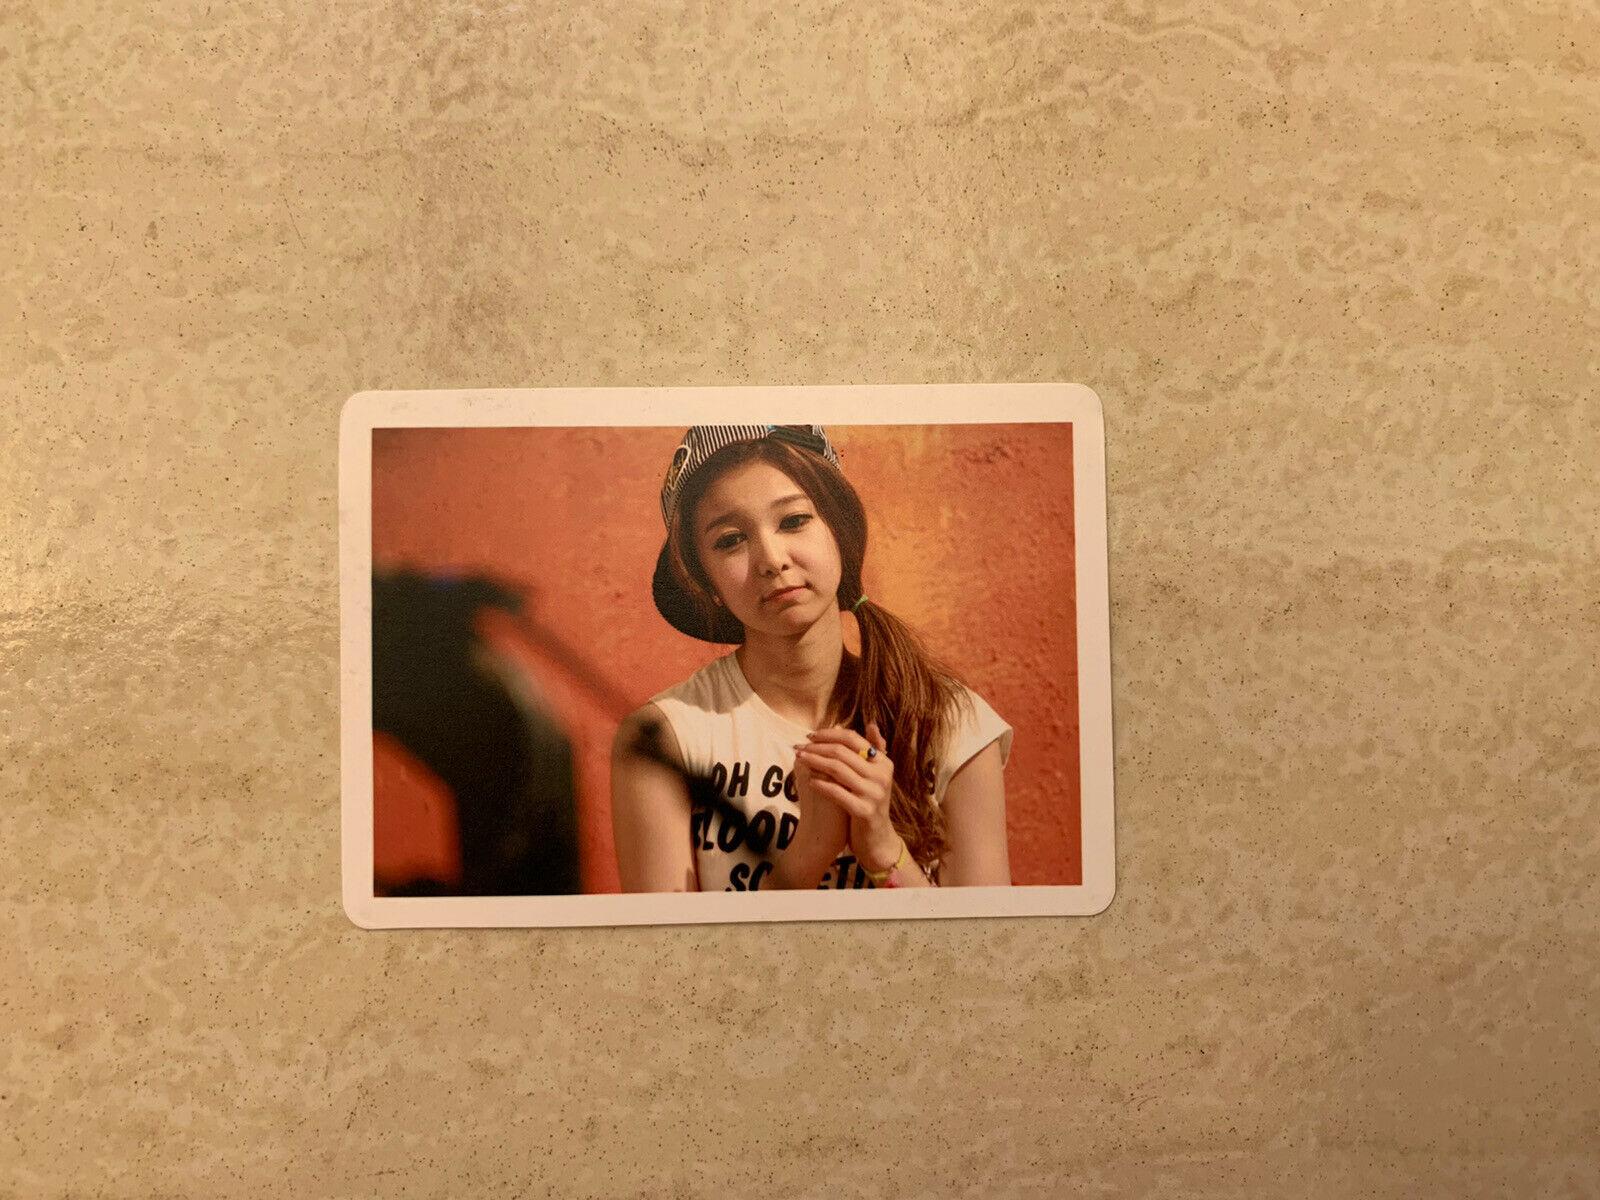 mostexpensivephotocards_19